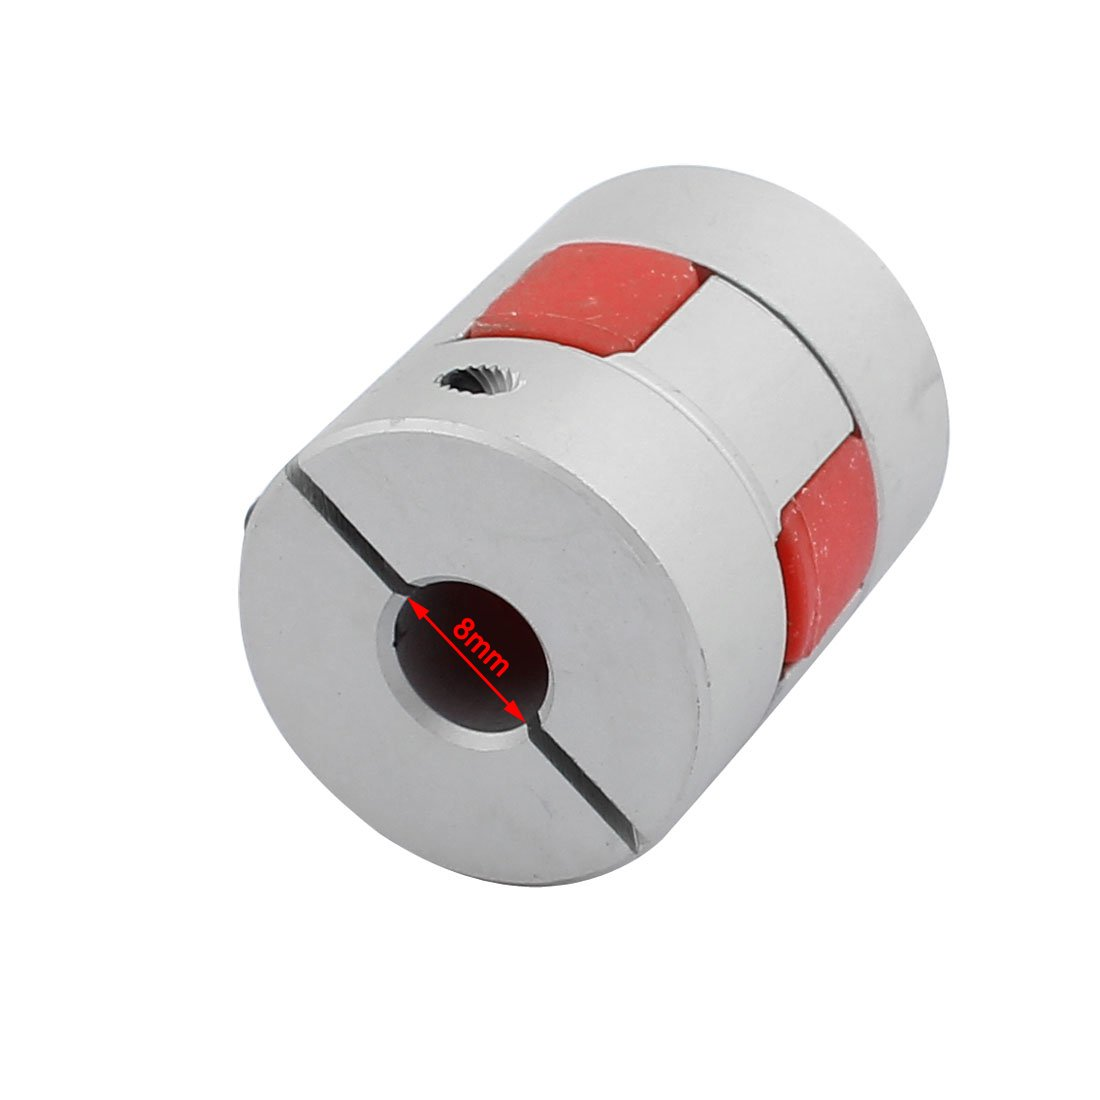 uxcell 8mm to 10mm Shaft Coupling 30mm Length 25mm Diameter Plum Motor Coupler Aluminum Alloy Joint Connector for DIY Encoder